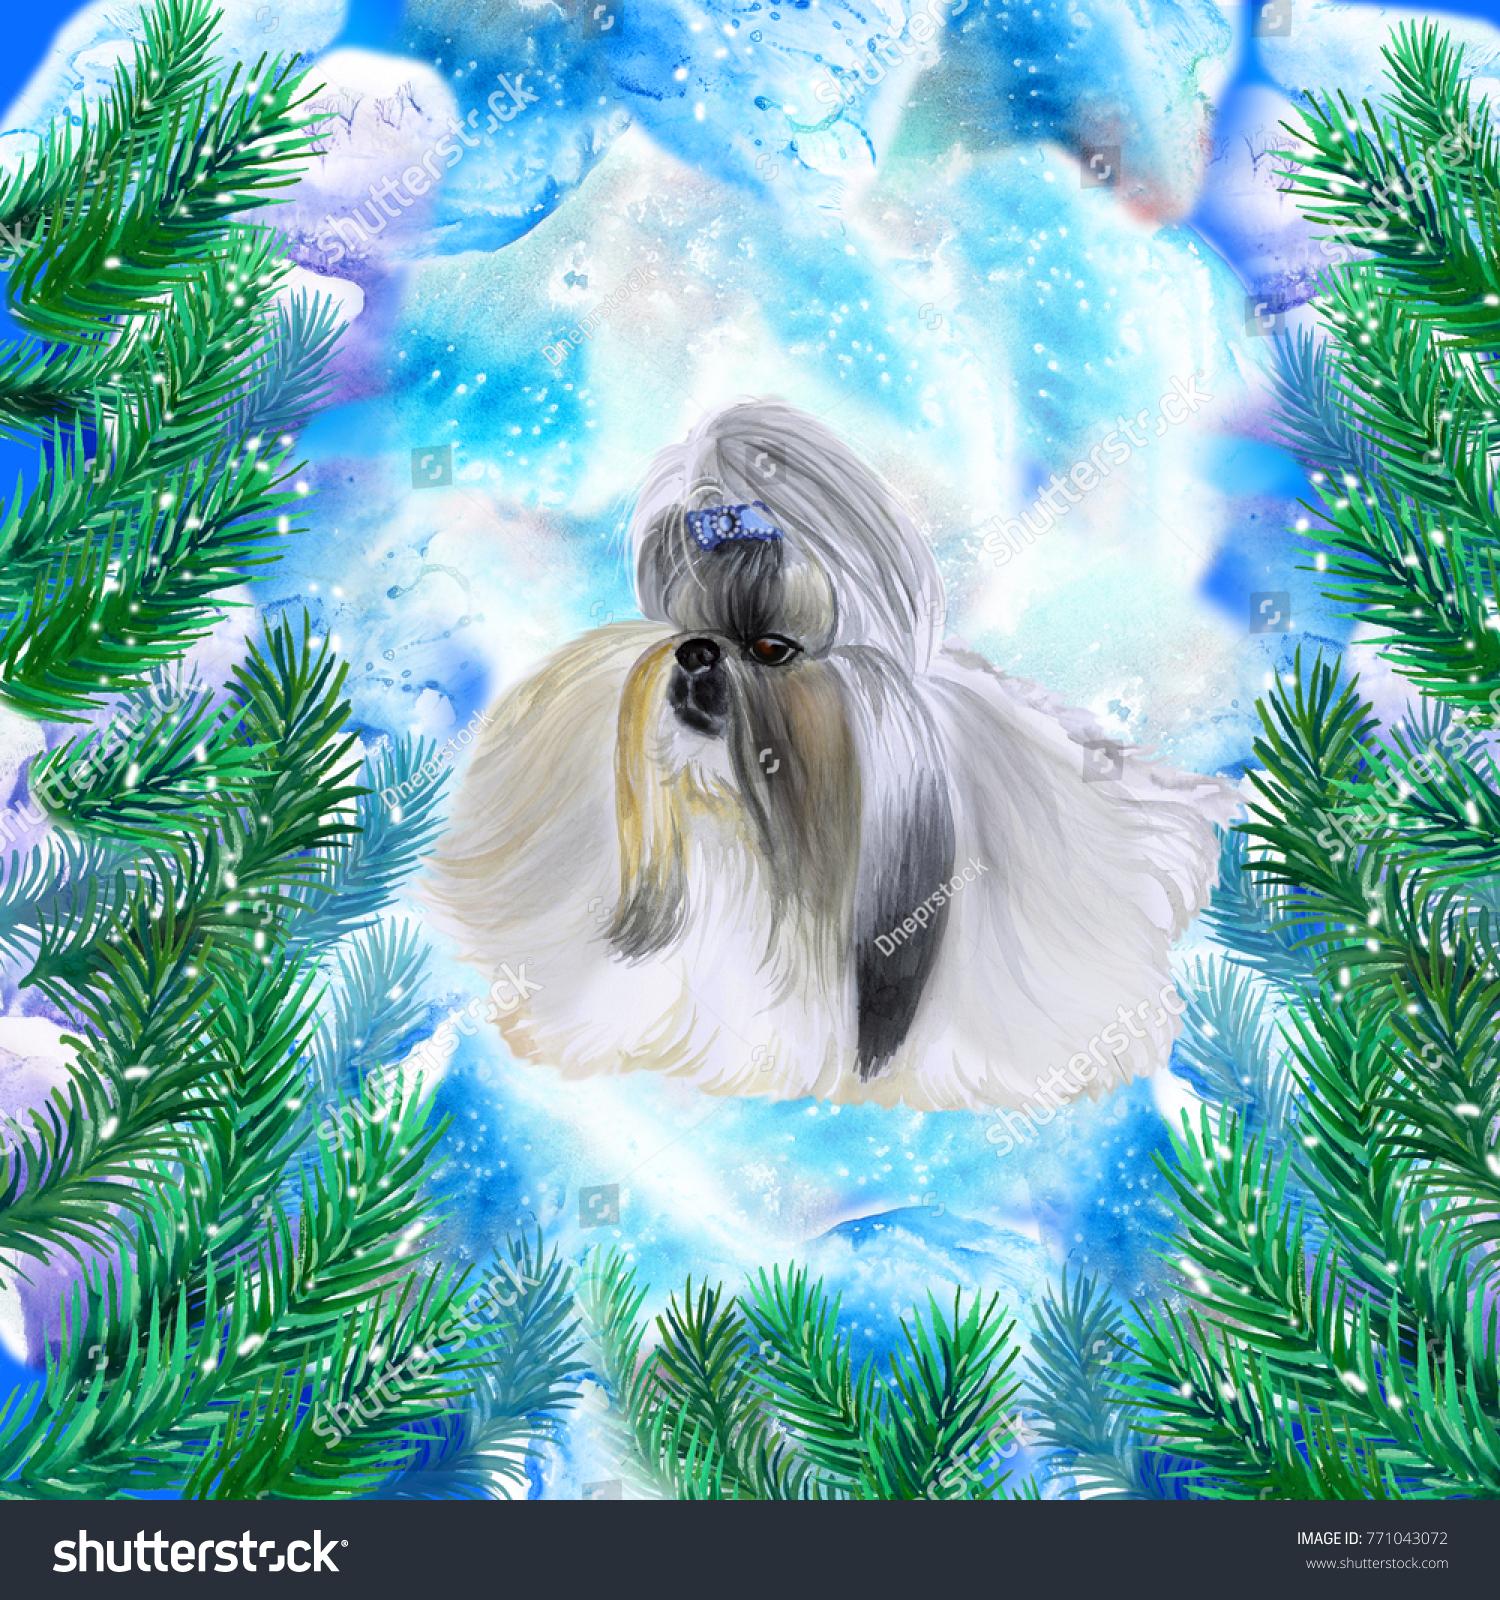 Shih Tzu Symbol New Year Christmas Stock Illustration 771043072 ...